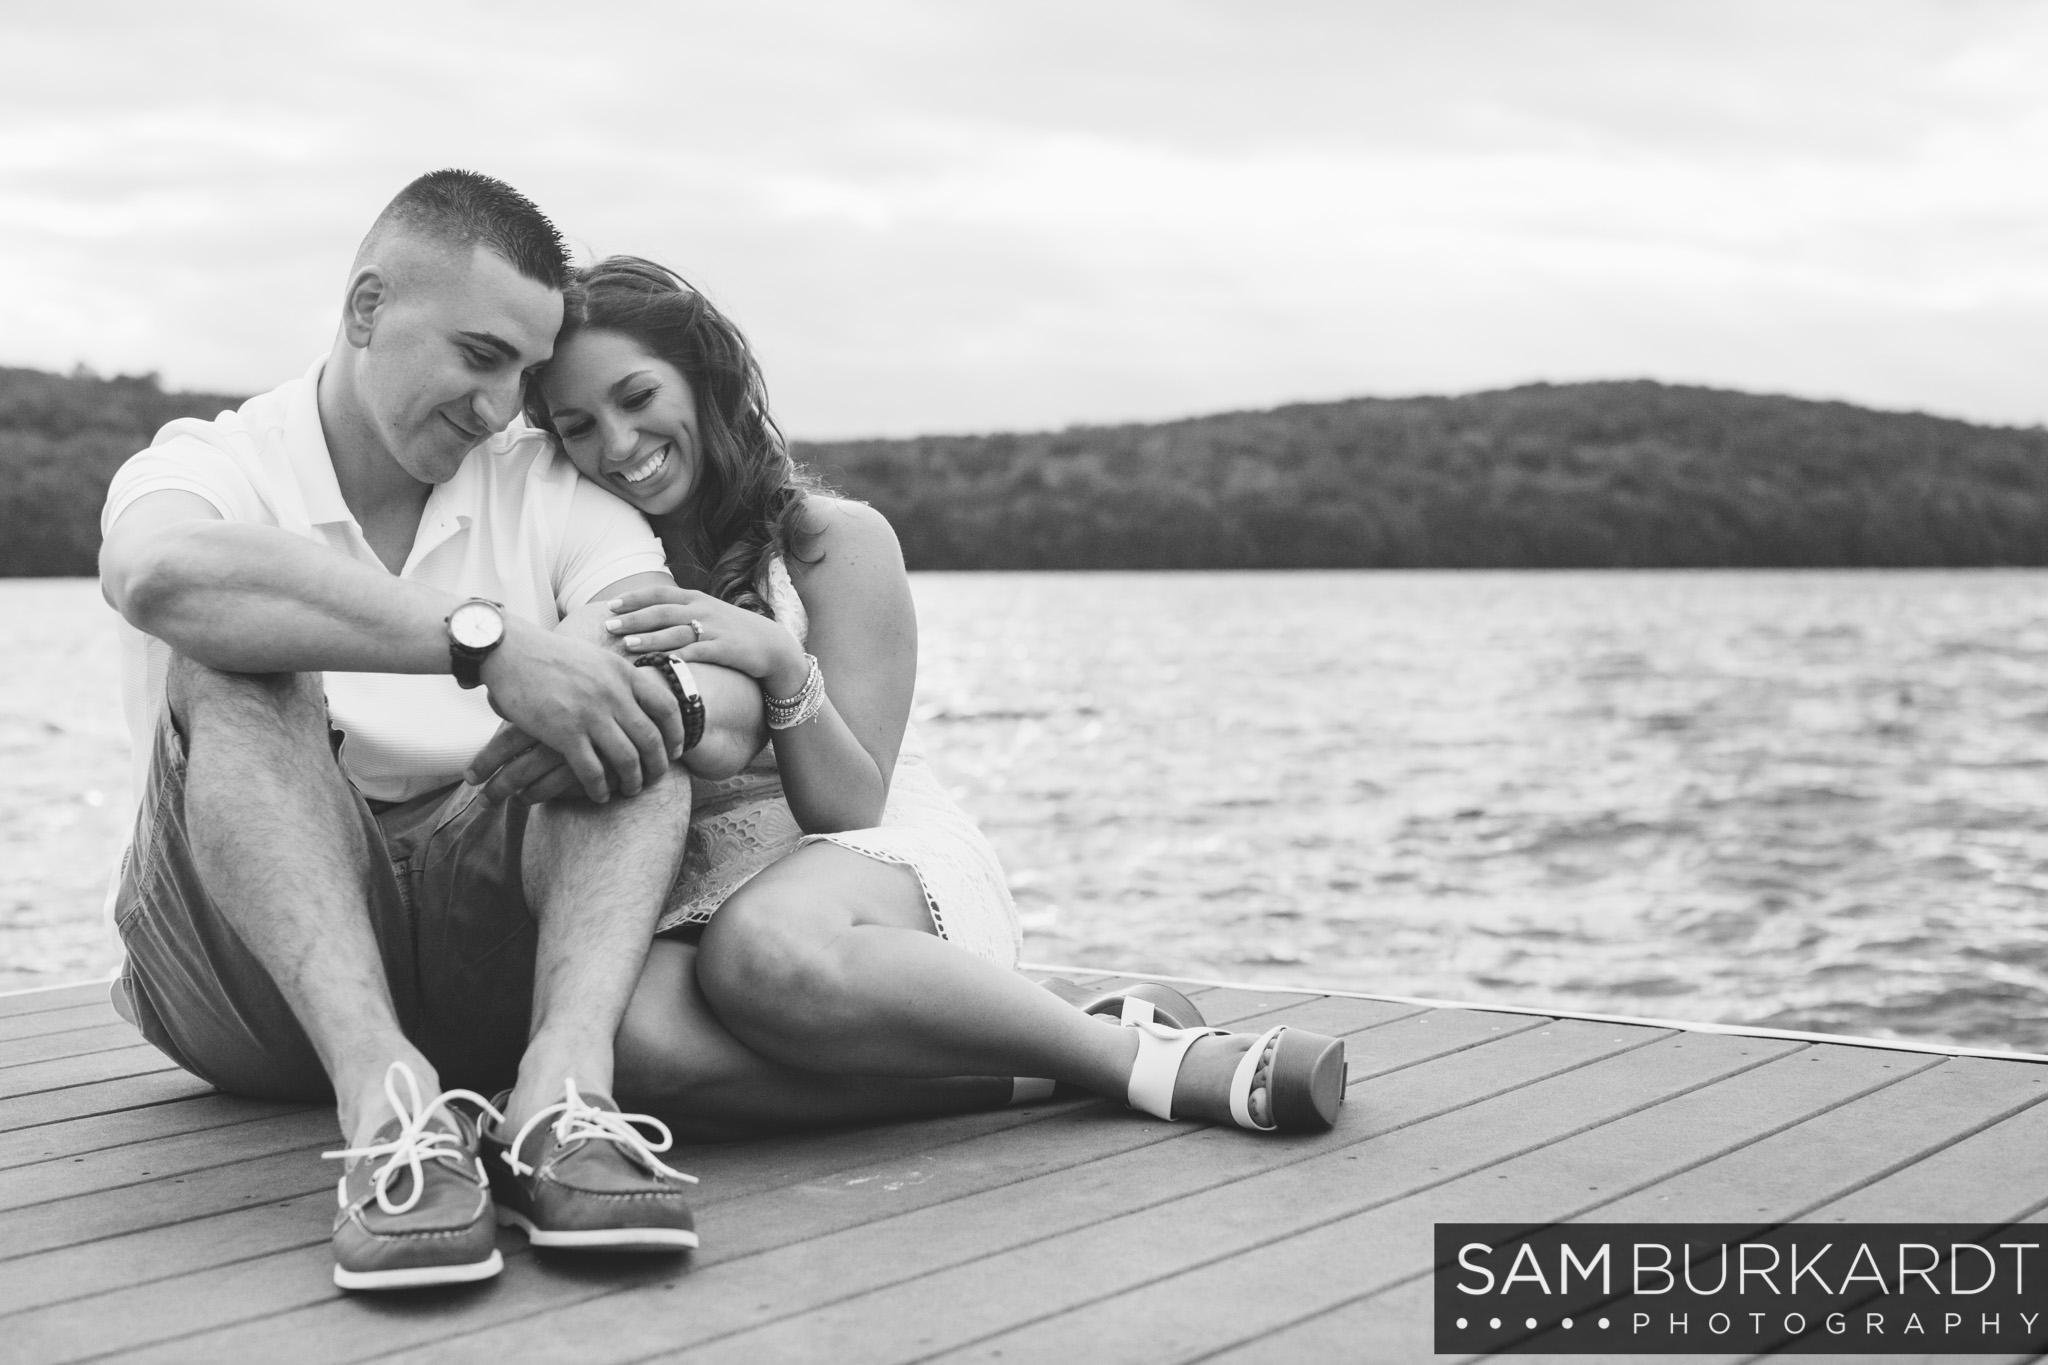 sburkardt_engagement_wedding_candlewood_lake_photography_001.jpg